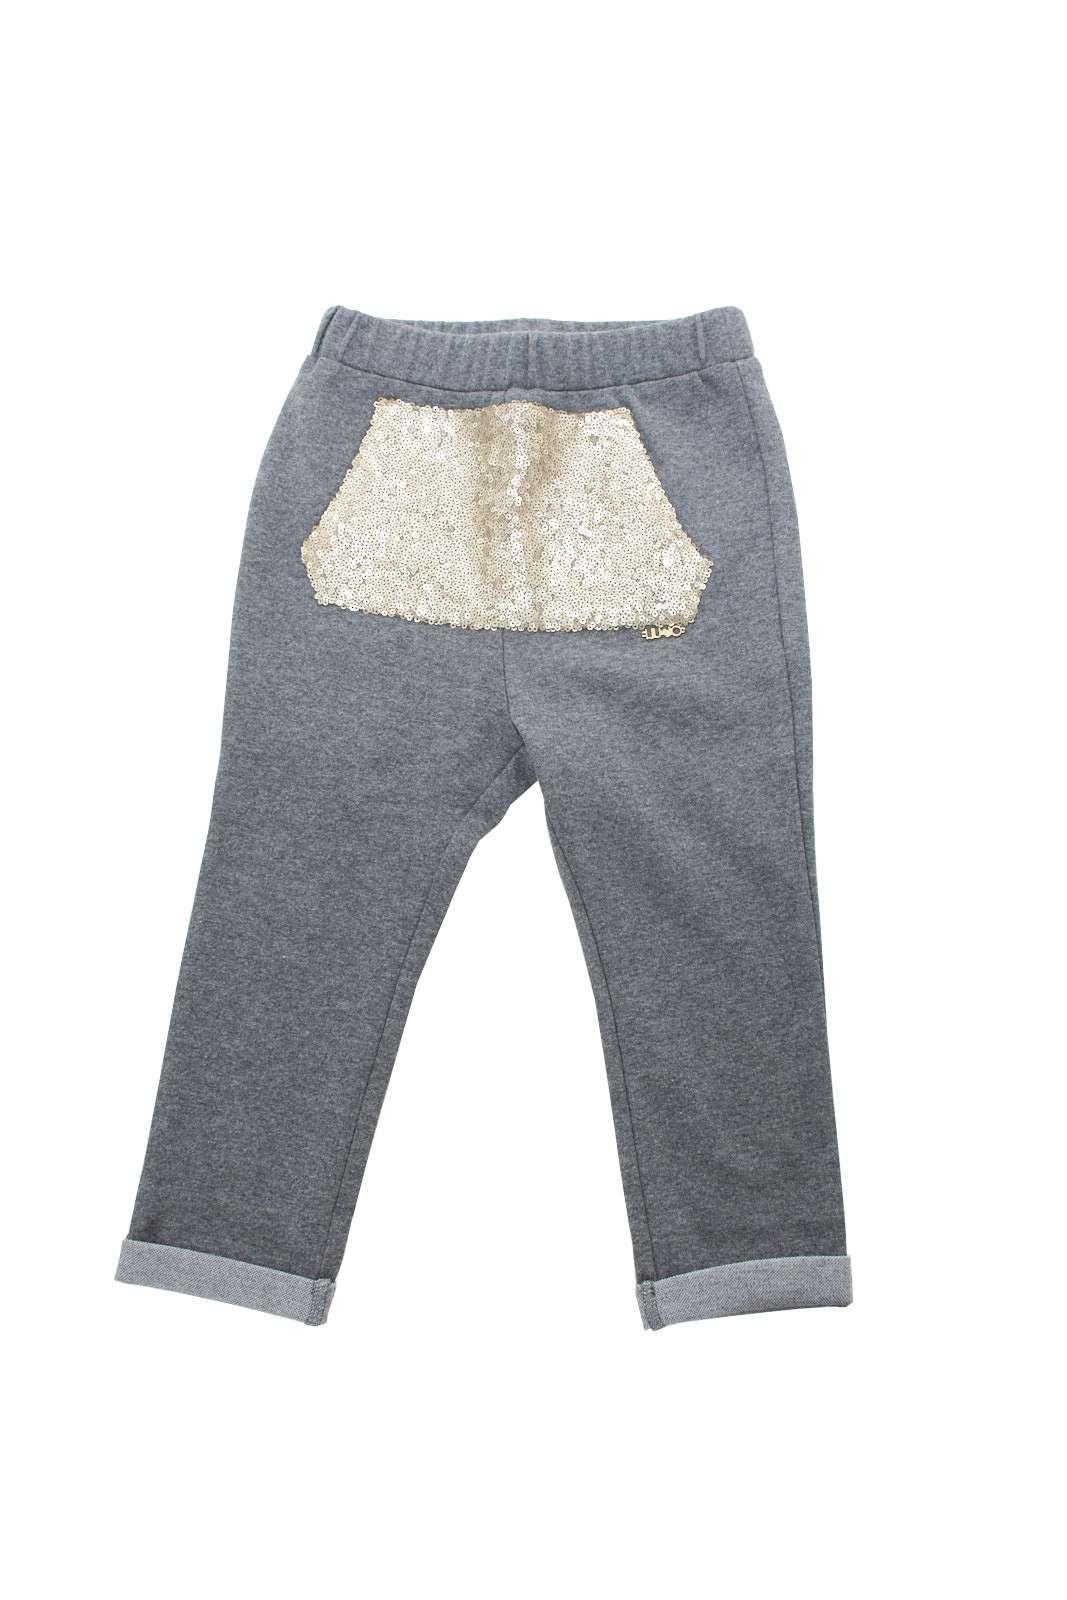 https://www.parmax.com/media/catalog/product/a/i/PE-outlet_parmax-pantaloni-bambina-Liu-Jo-K68059-A.jpg